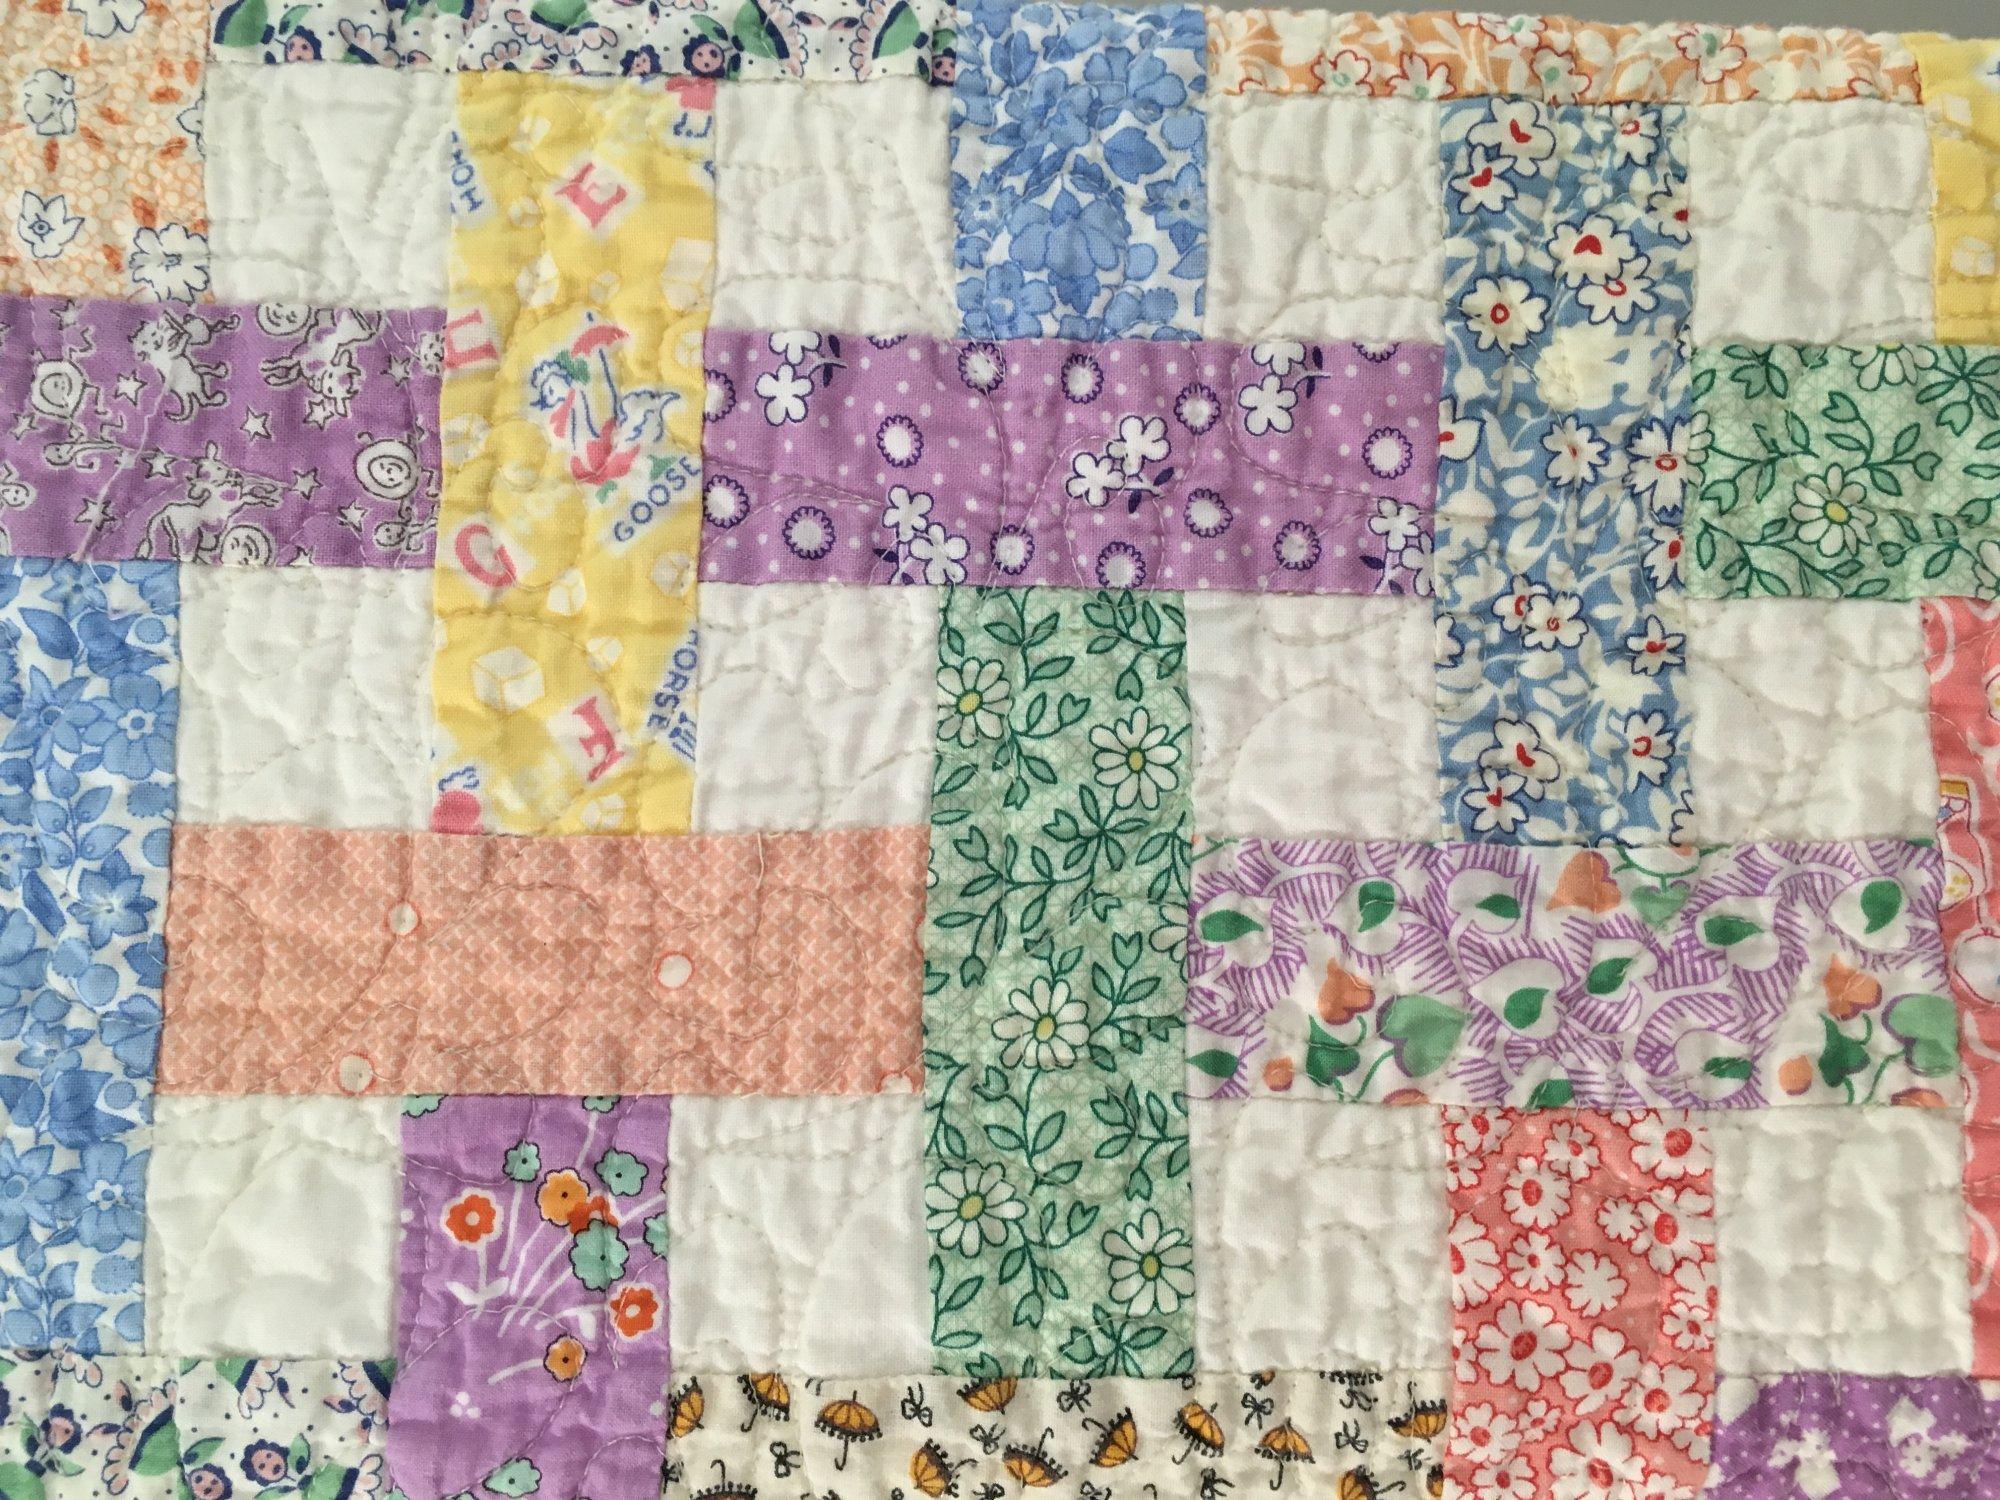 Magnolia Quilt Co. - Basket Weave Pattern